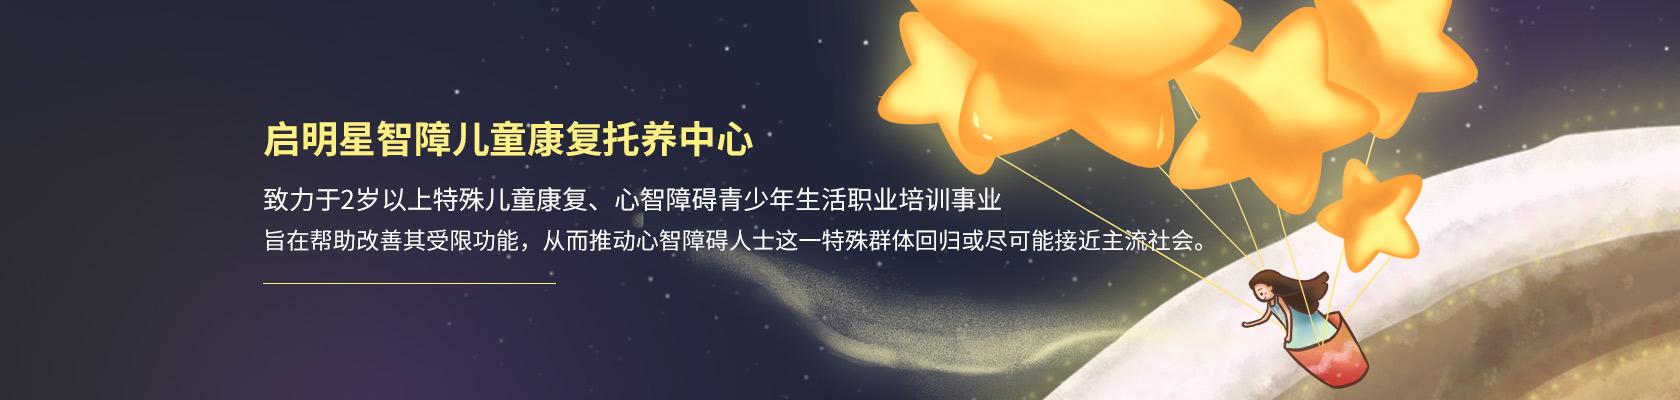 http://www.cqqimingxing.com/data/upload/202101/20210129120040_457.jpg